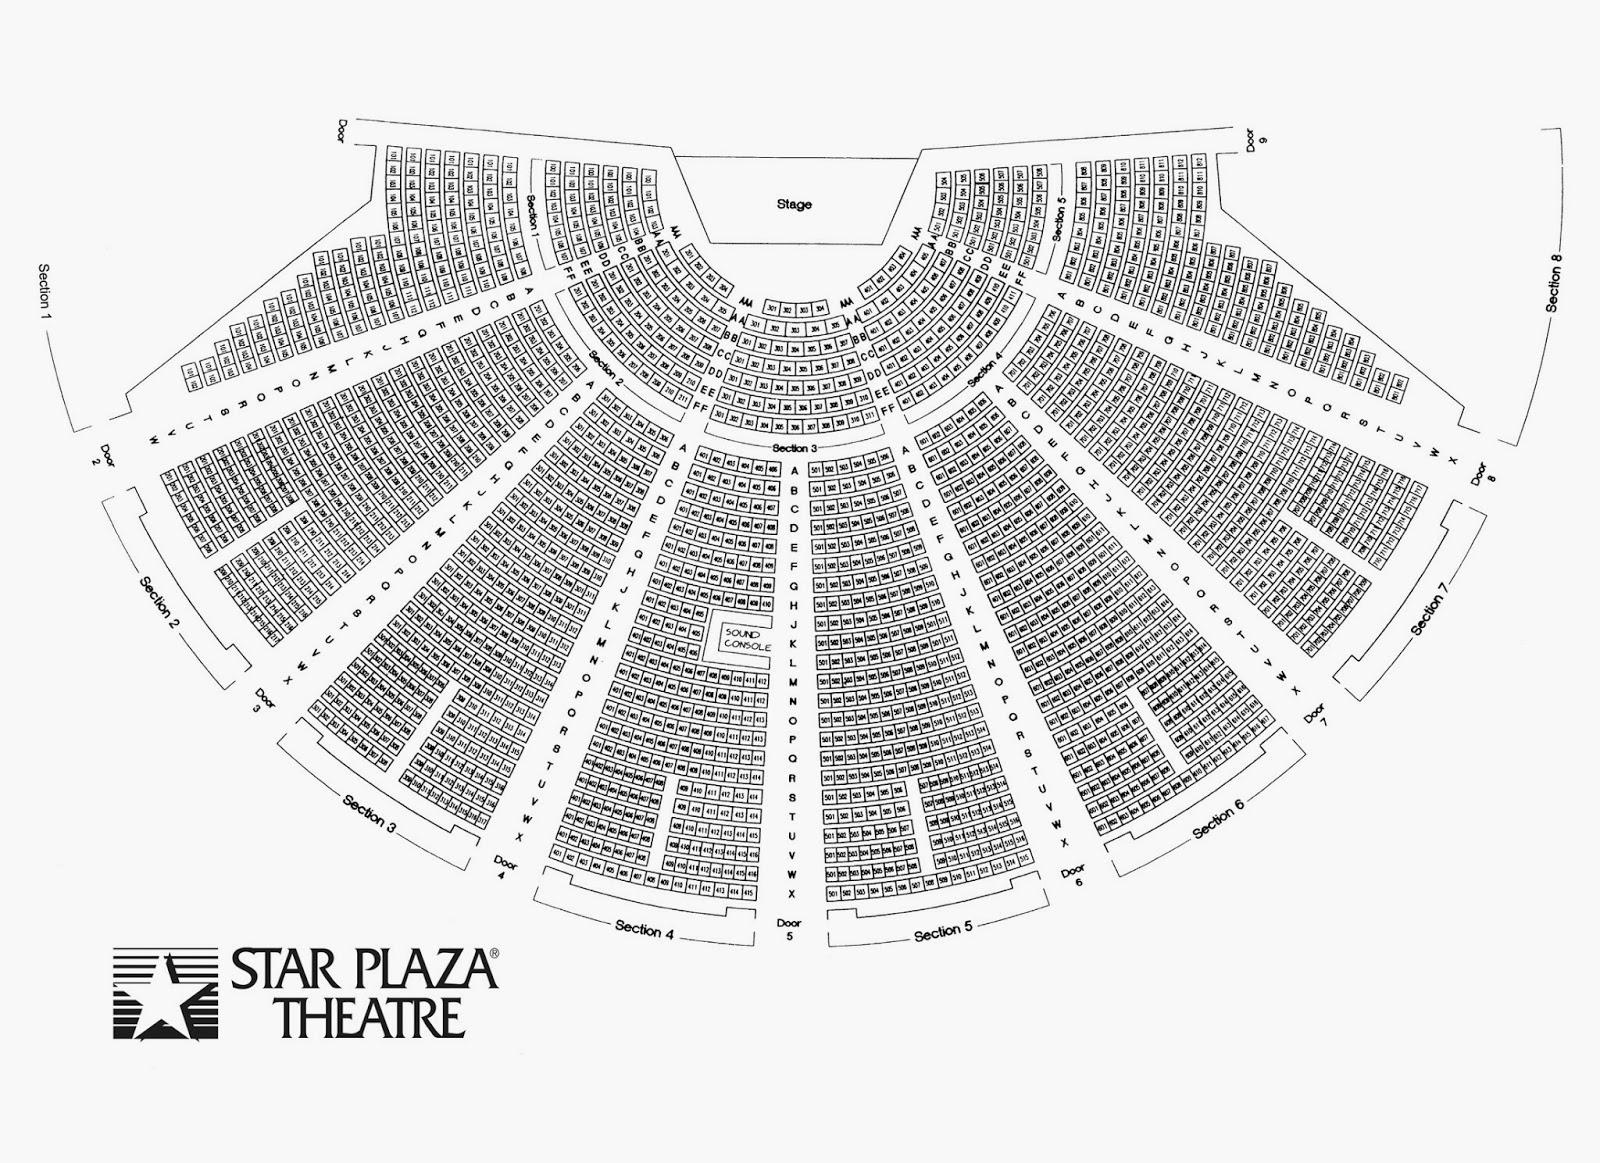 Star plaza seating chart brokeasshome com